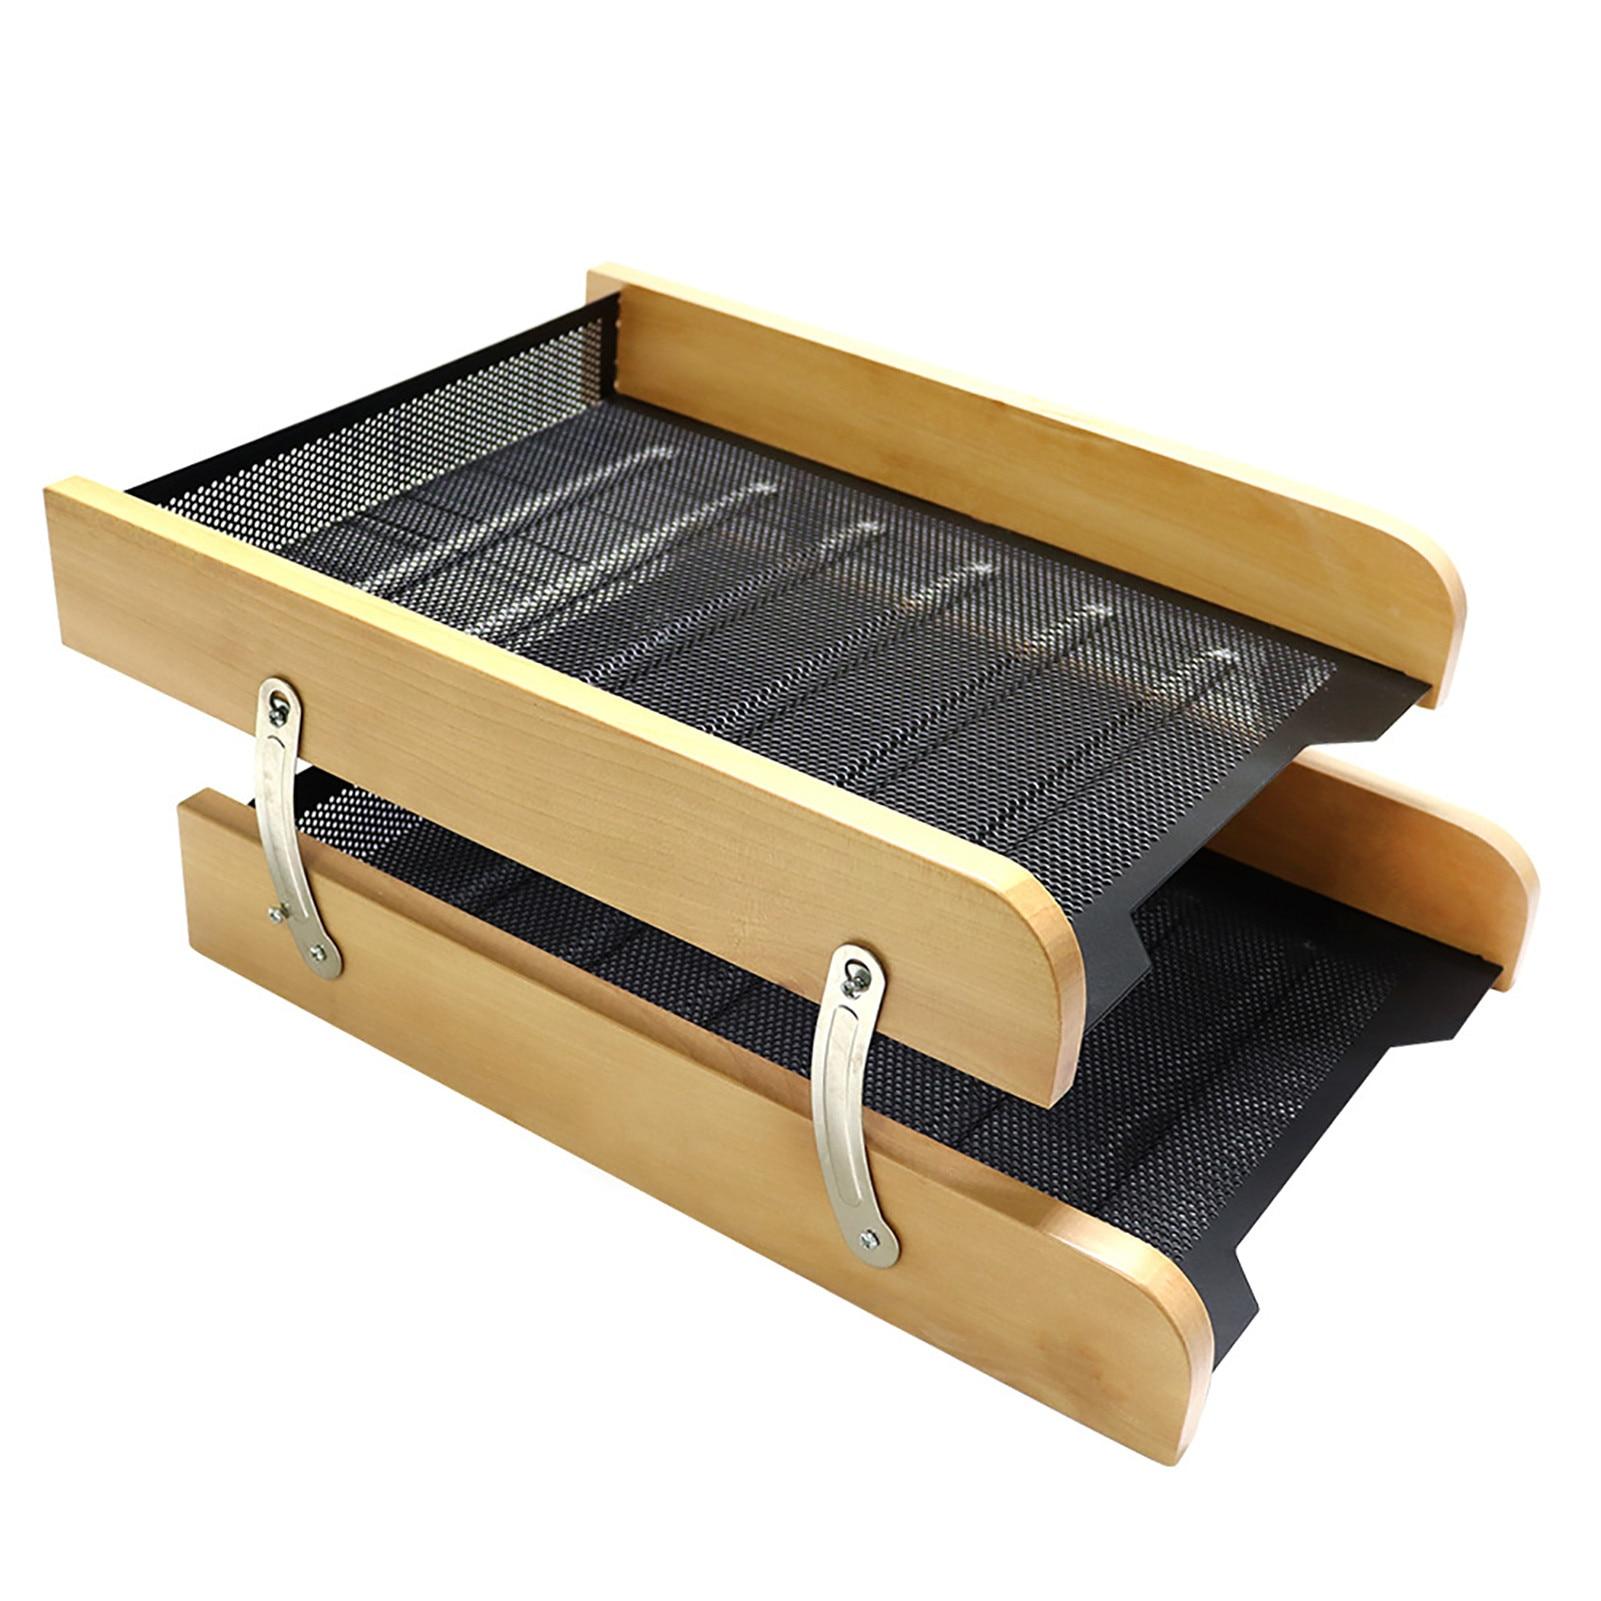 New High Quality Double Layer Practical Office Shelf Folder Metal Mesh Rack Folder Storage Box Case Office Desk Organizer